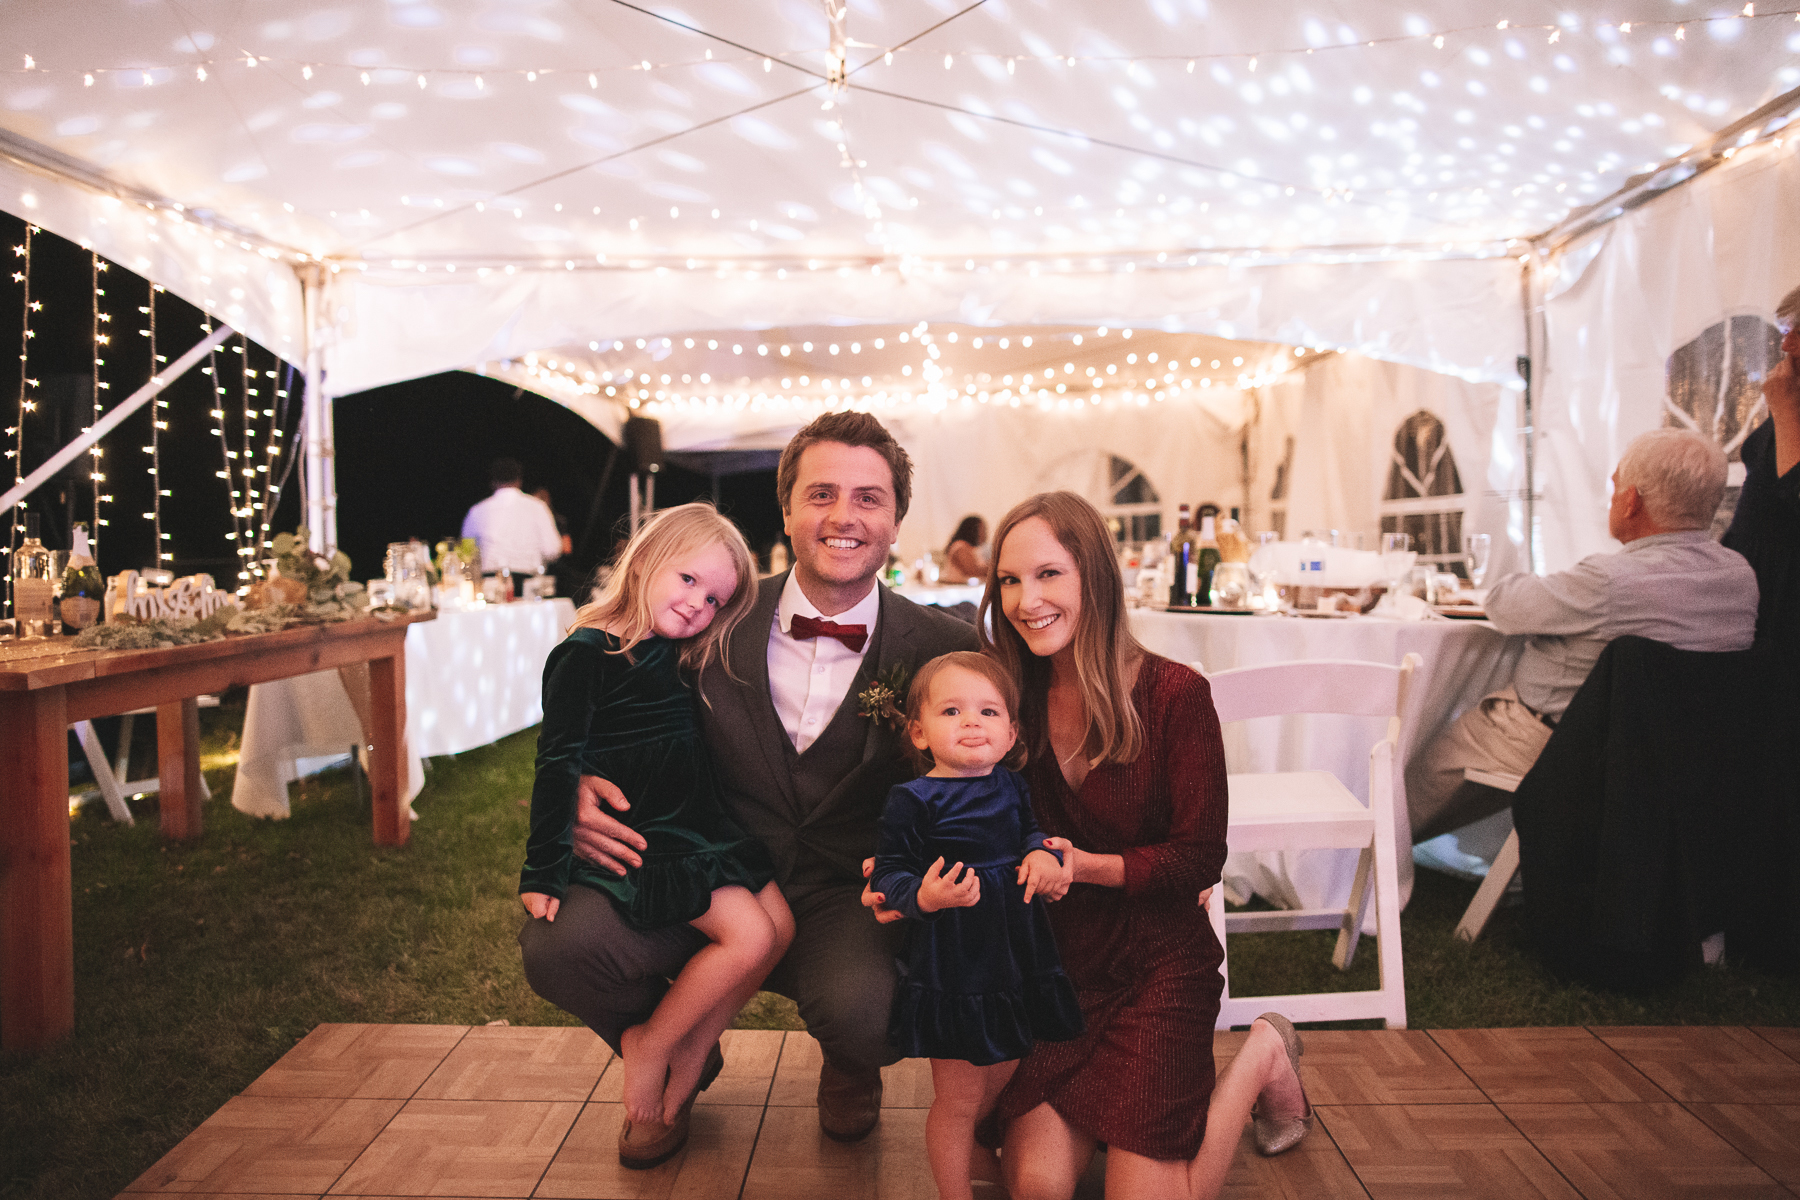 larkin family | Charlie and Shirleys Wedding